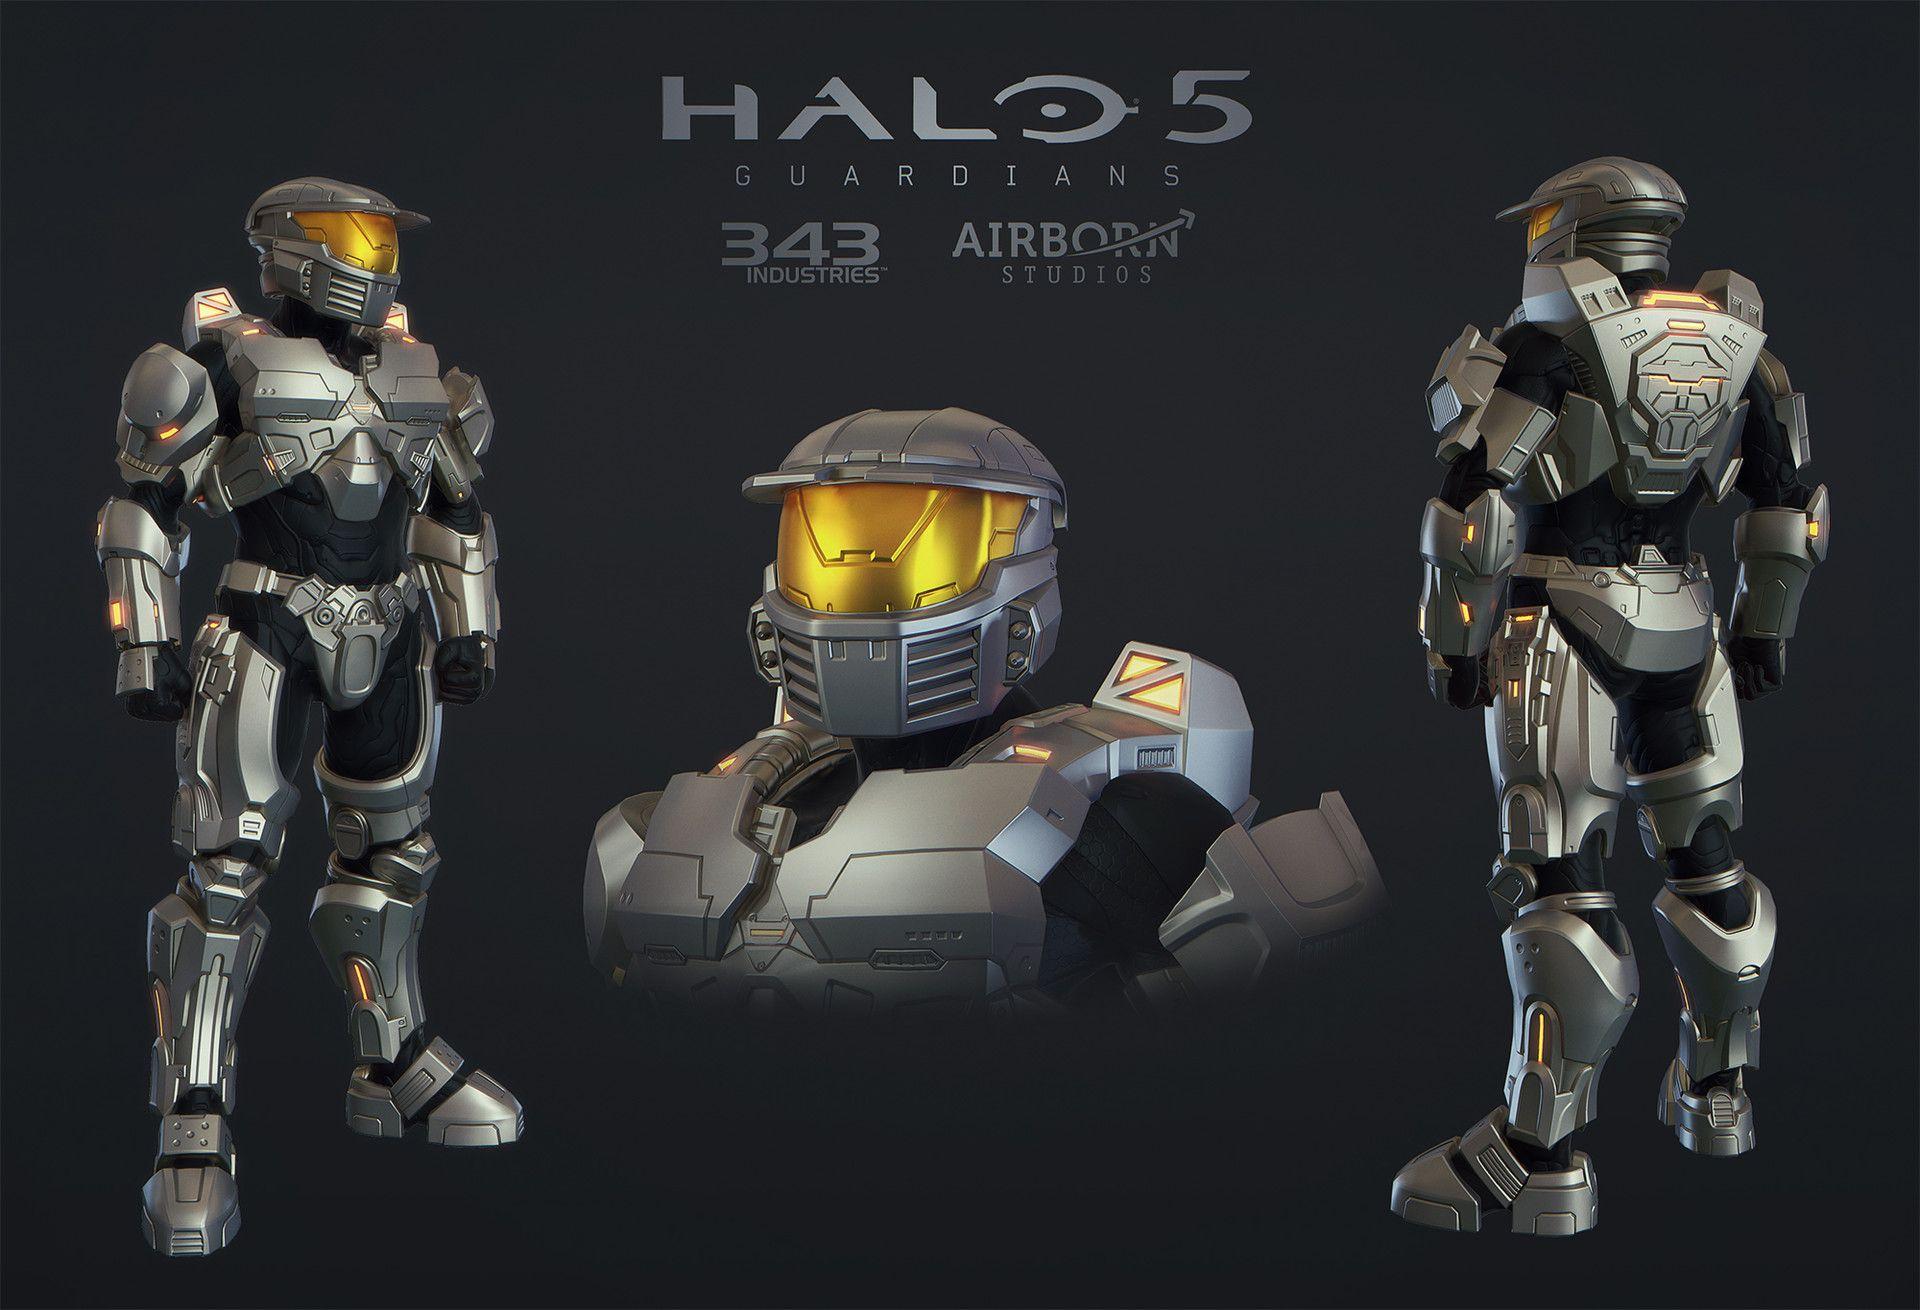 ArtStation - Halo 5 Multiplayer Armor MARK IV [GEN1], Airborn